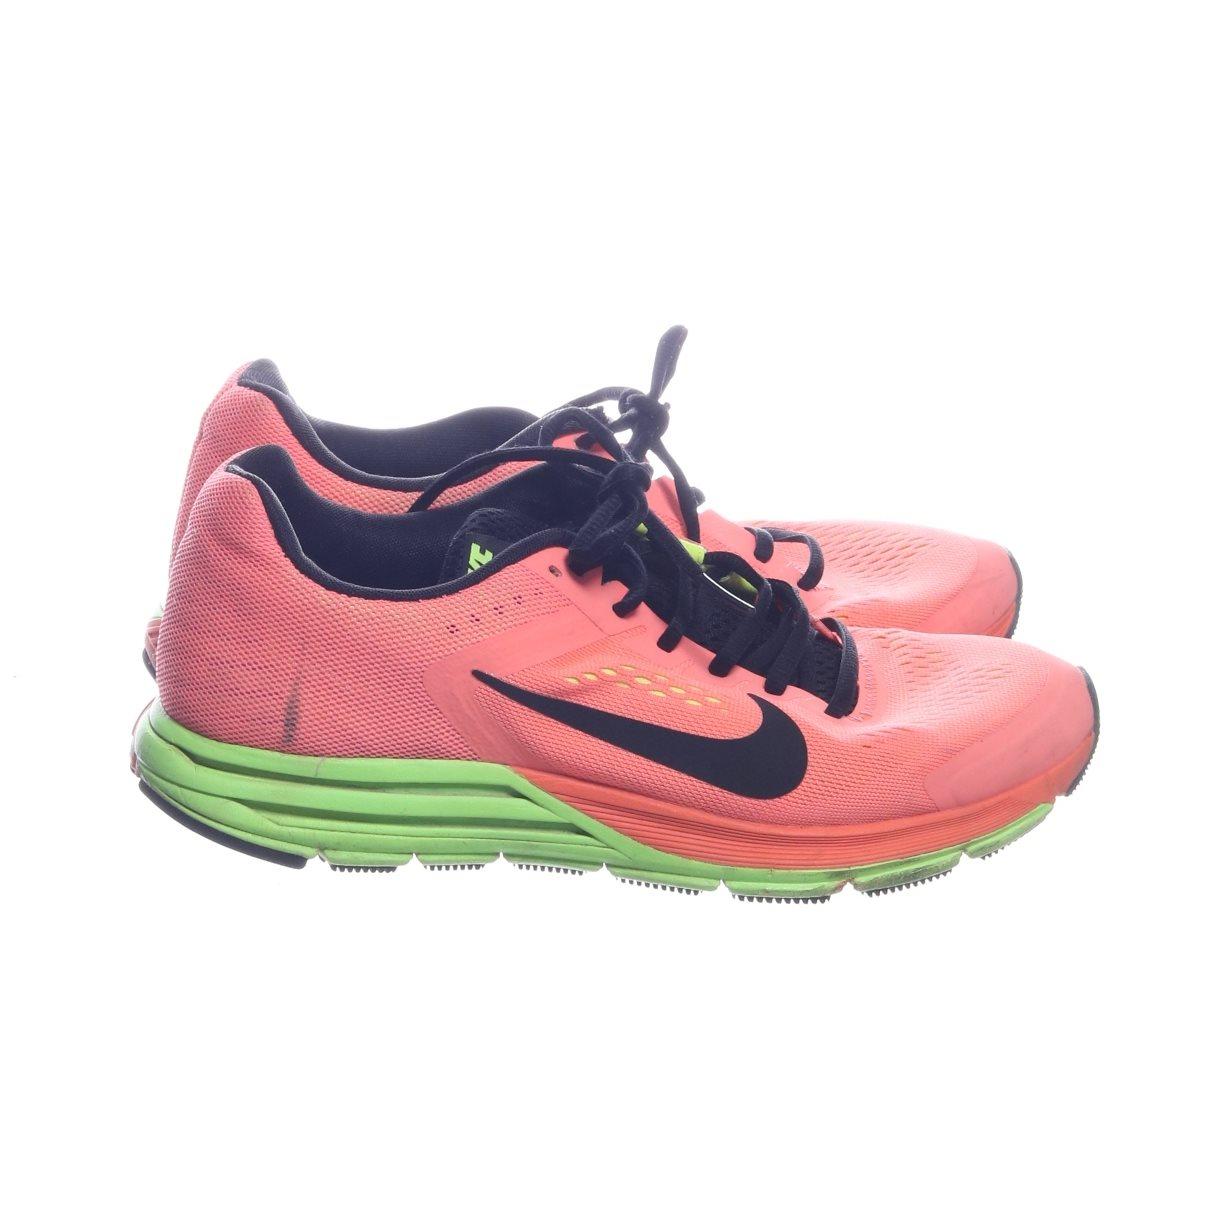 timeless design 75274 d3f5e Nike, Sneakers, Strl  41, STRUCTURE 17, Orange Grön, Polyester